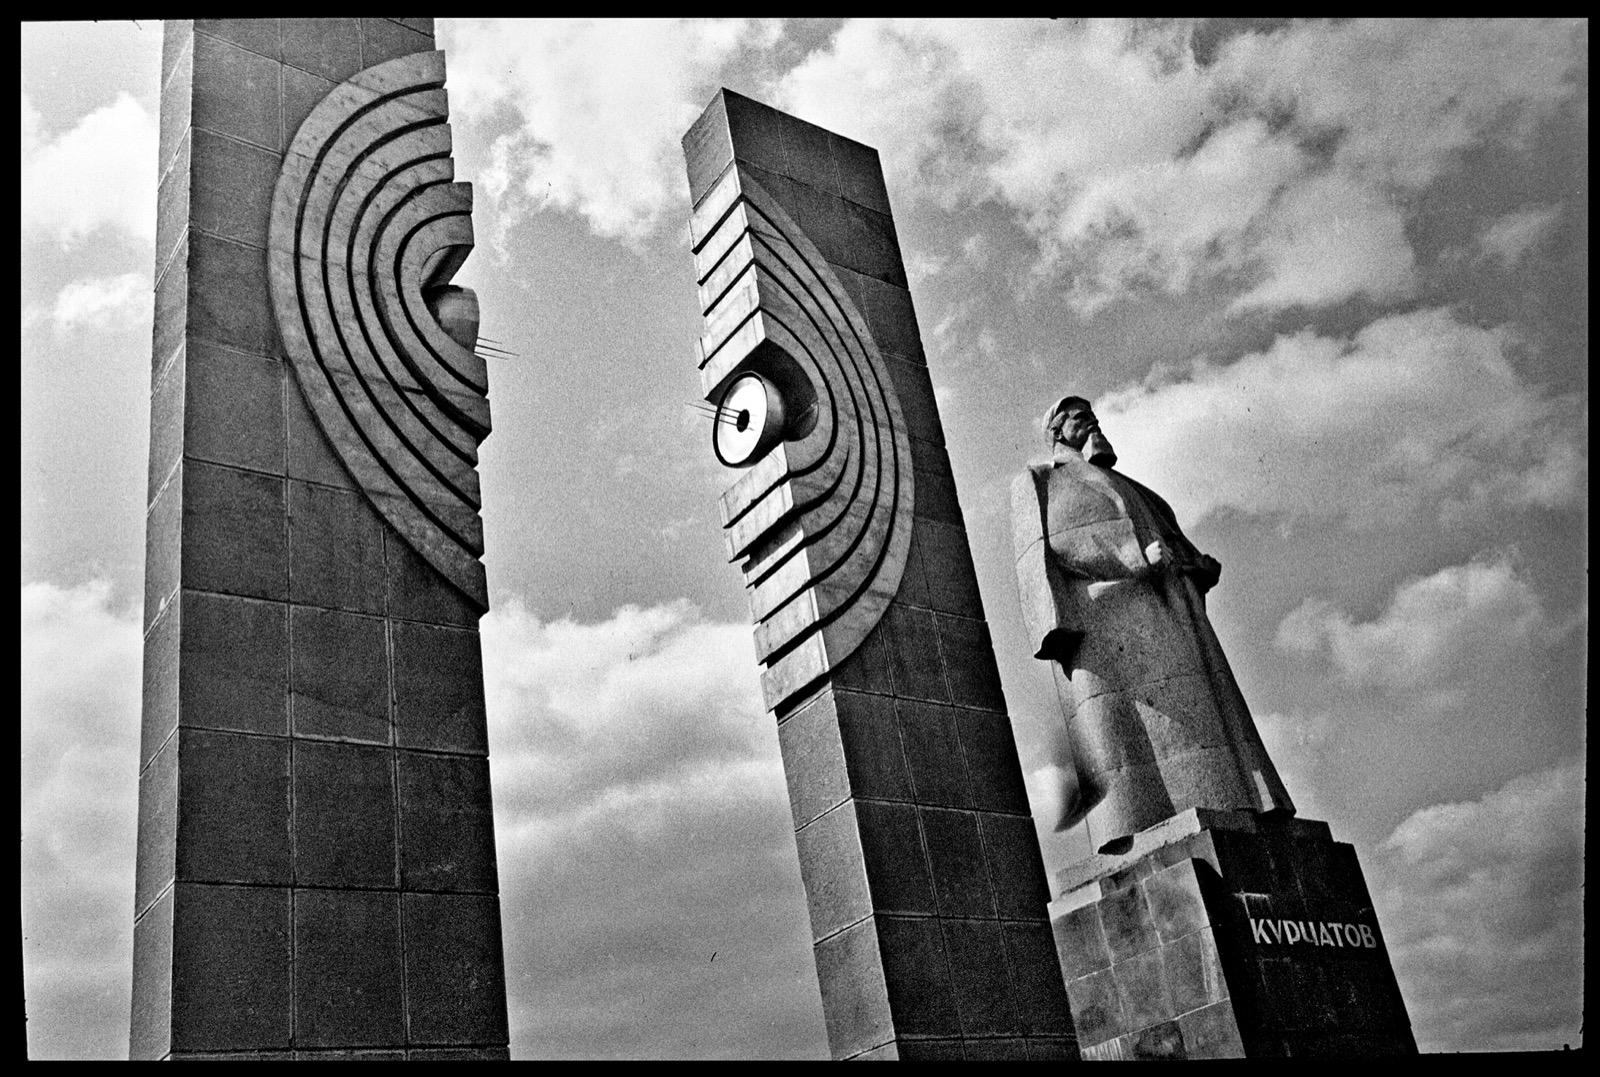 2 Monument to Splitting of Atom USSR